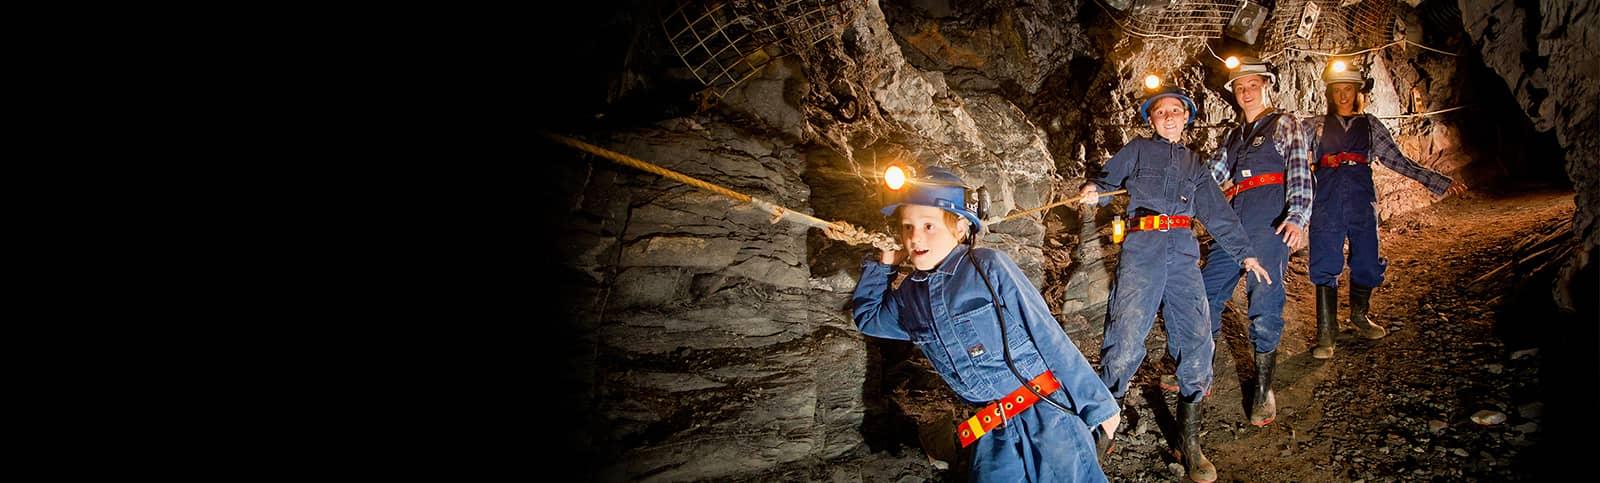 Visitors walking through underground tunnels on an Adventure Tour